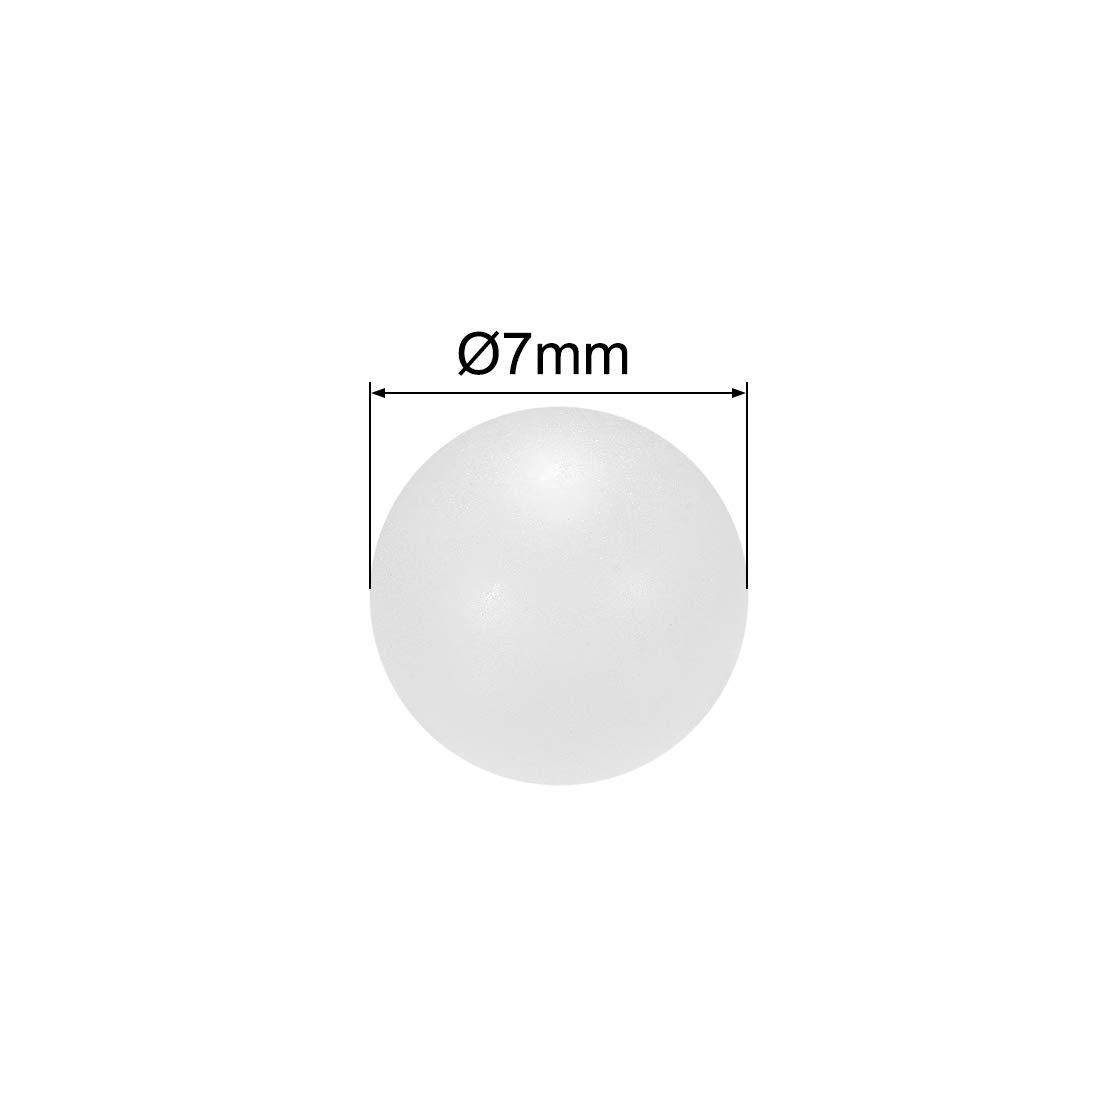 uxcell 4mm PP Solid Plastic Balls Precision Bearing Ball 200pcs